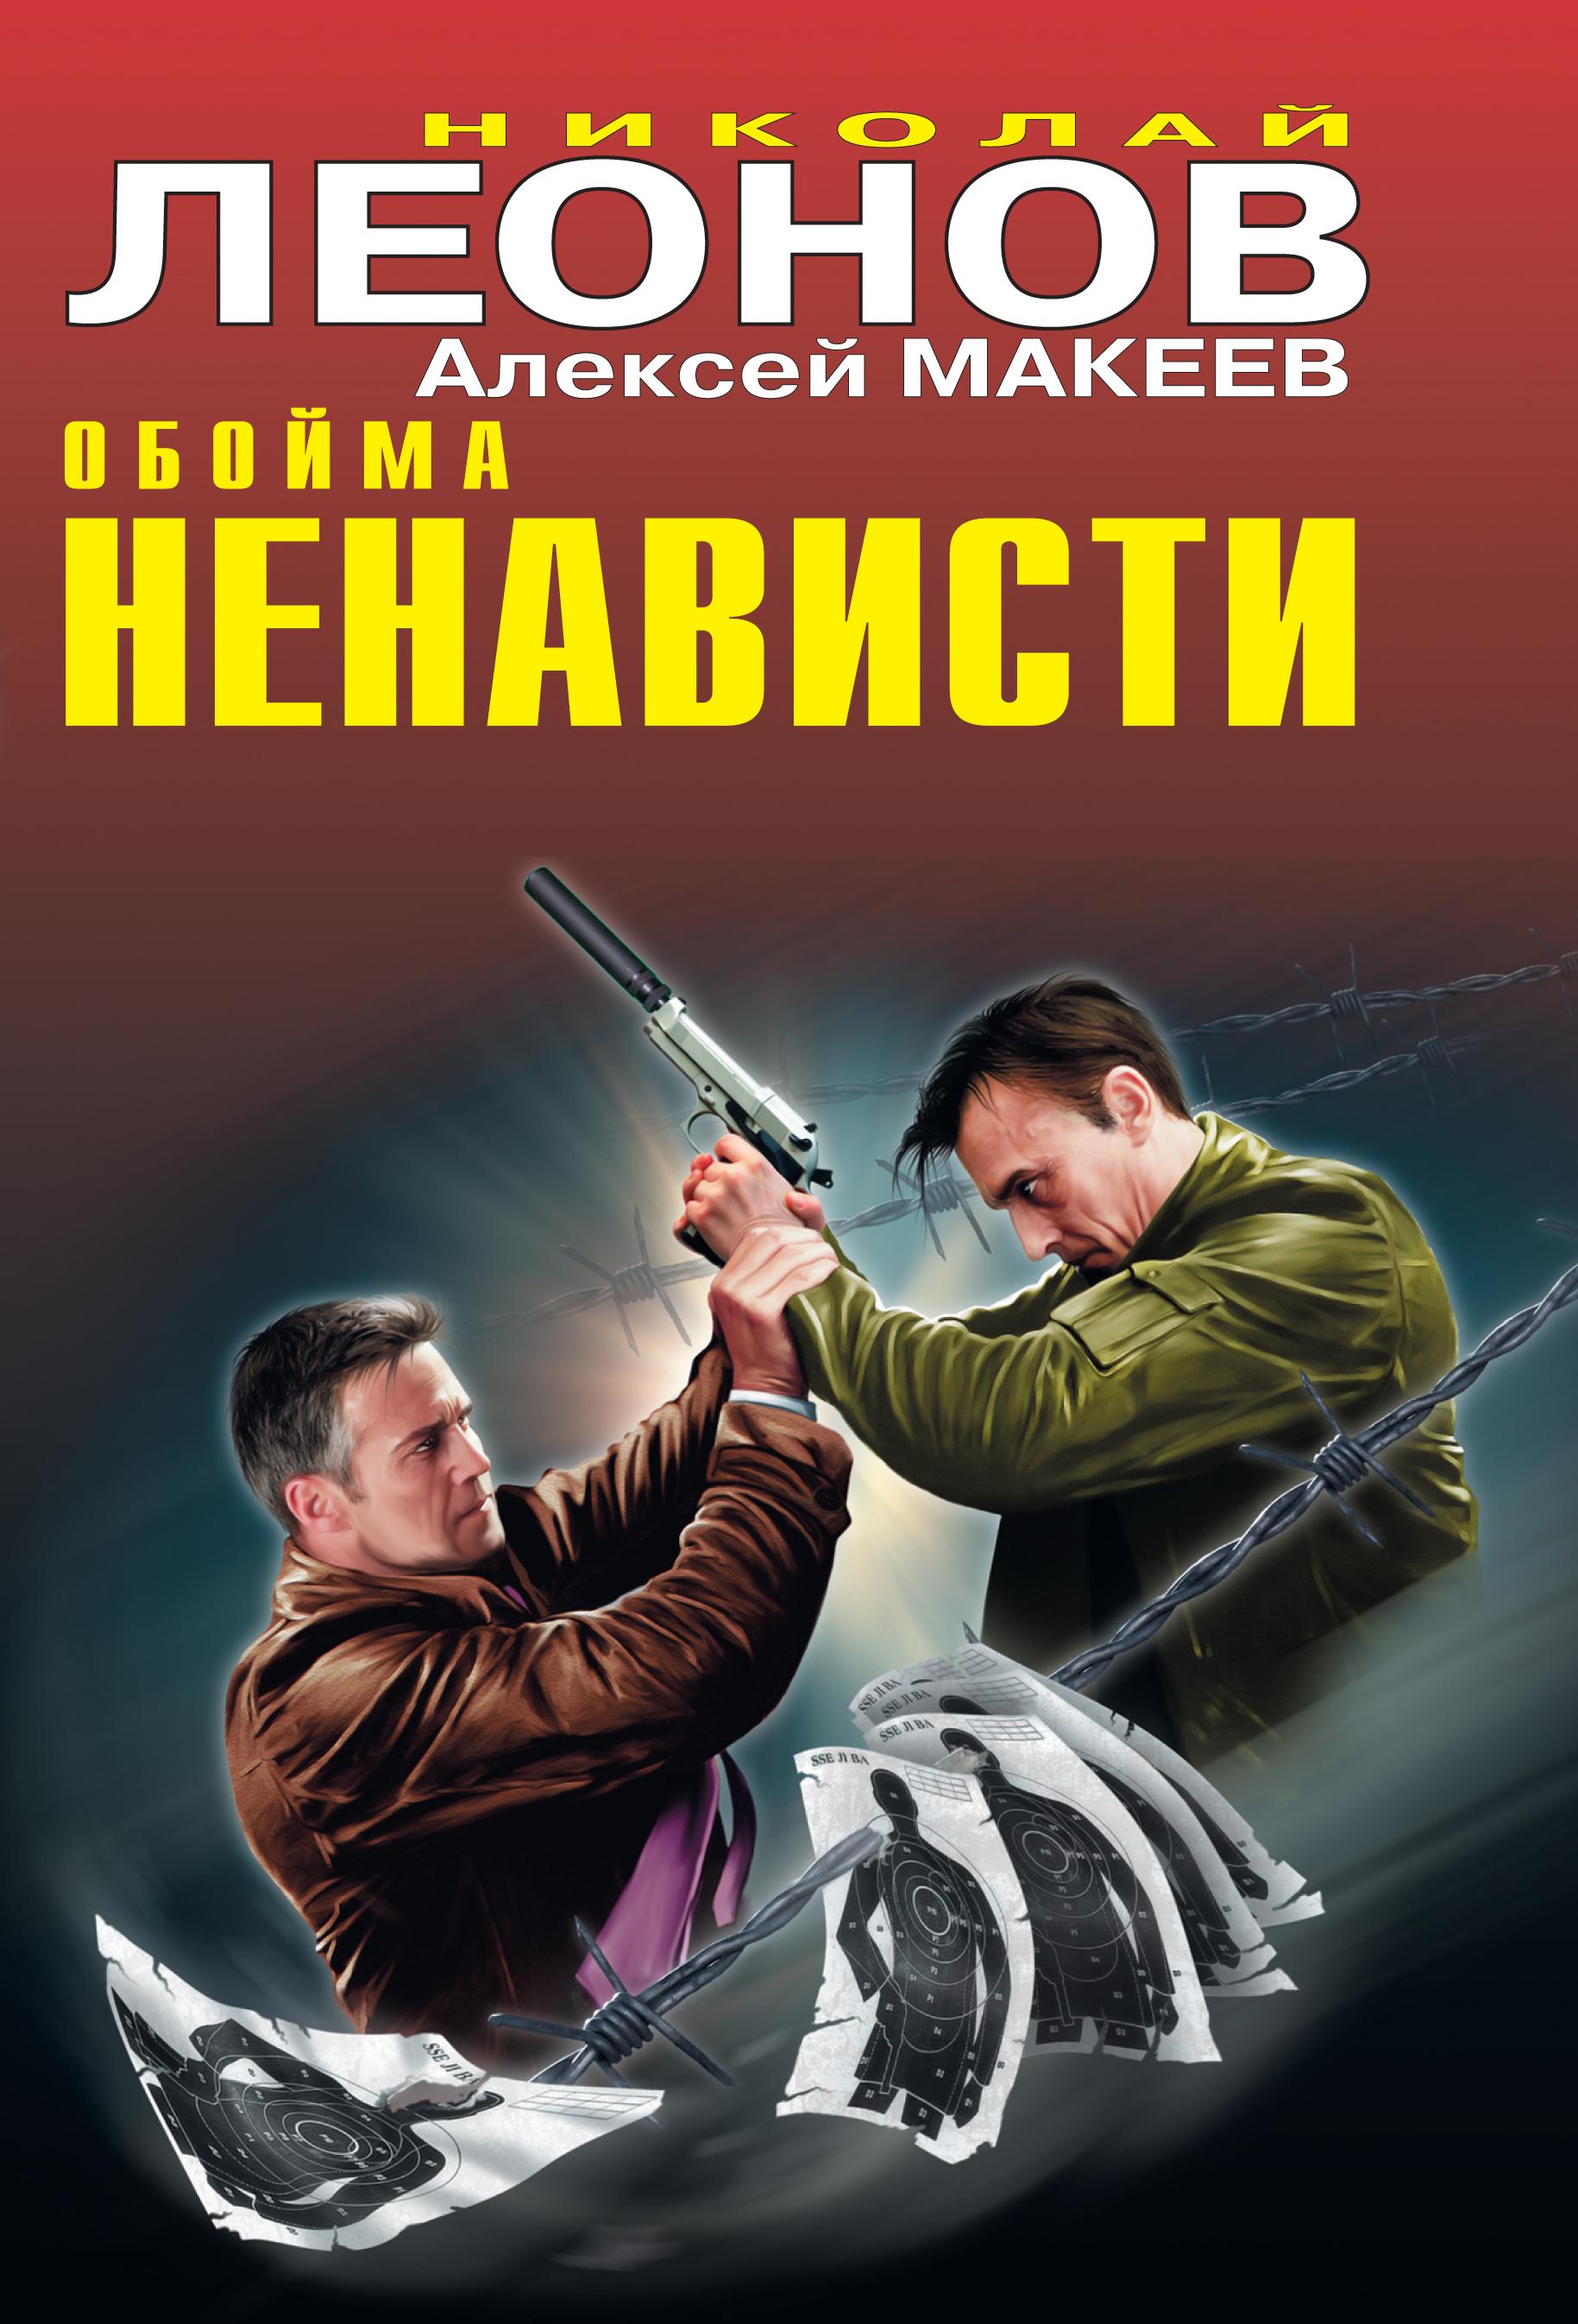 Обойма ненависти ( Леонов Н.И., Макеев А.В.  )